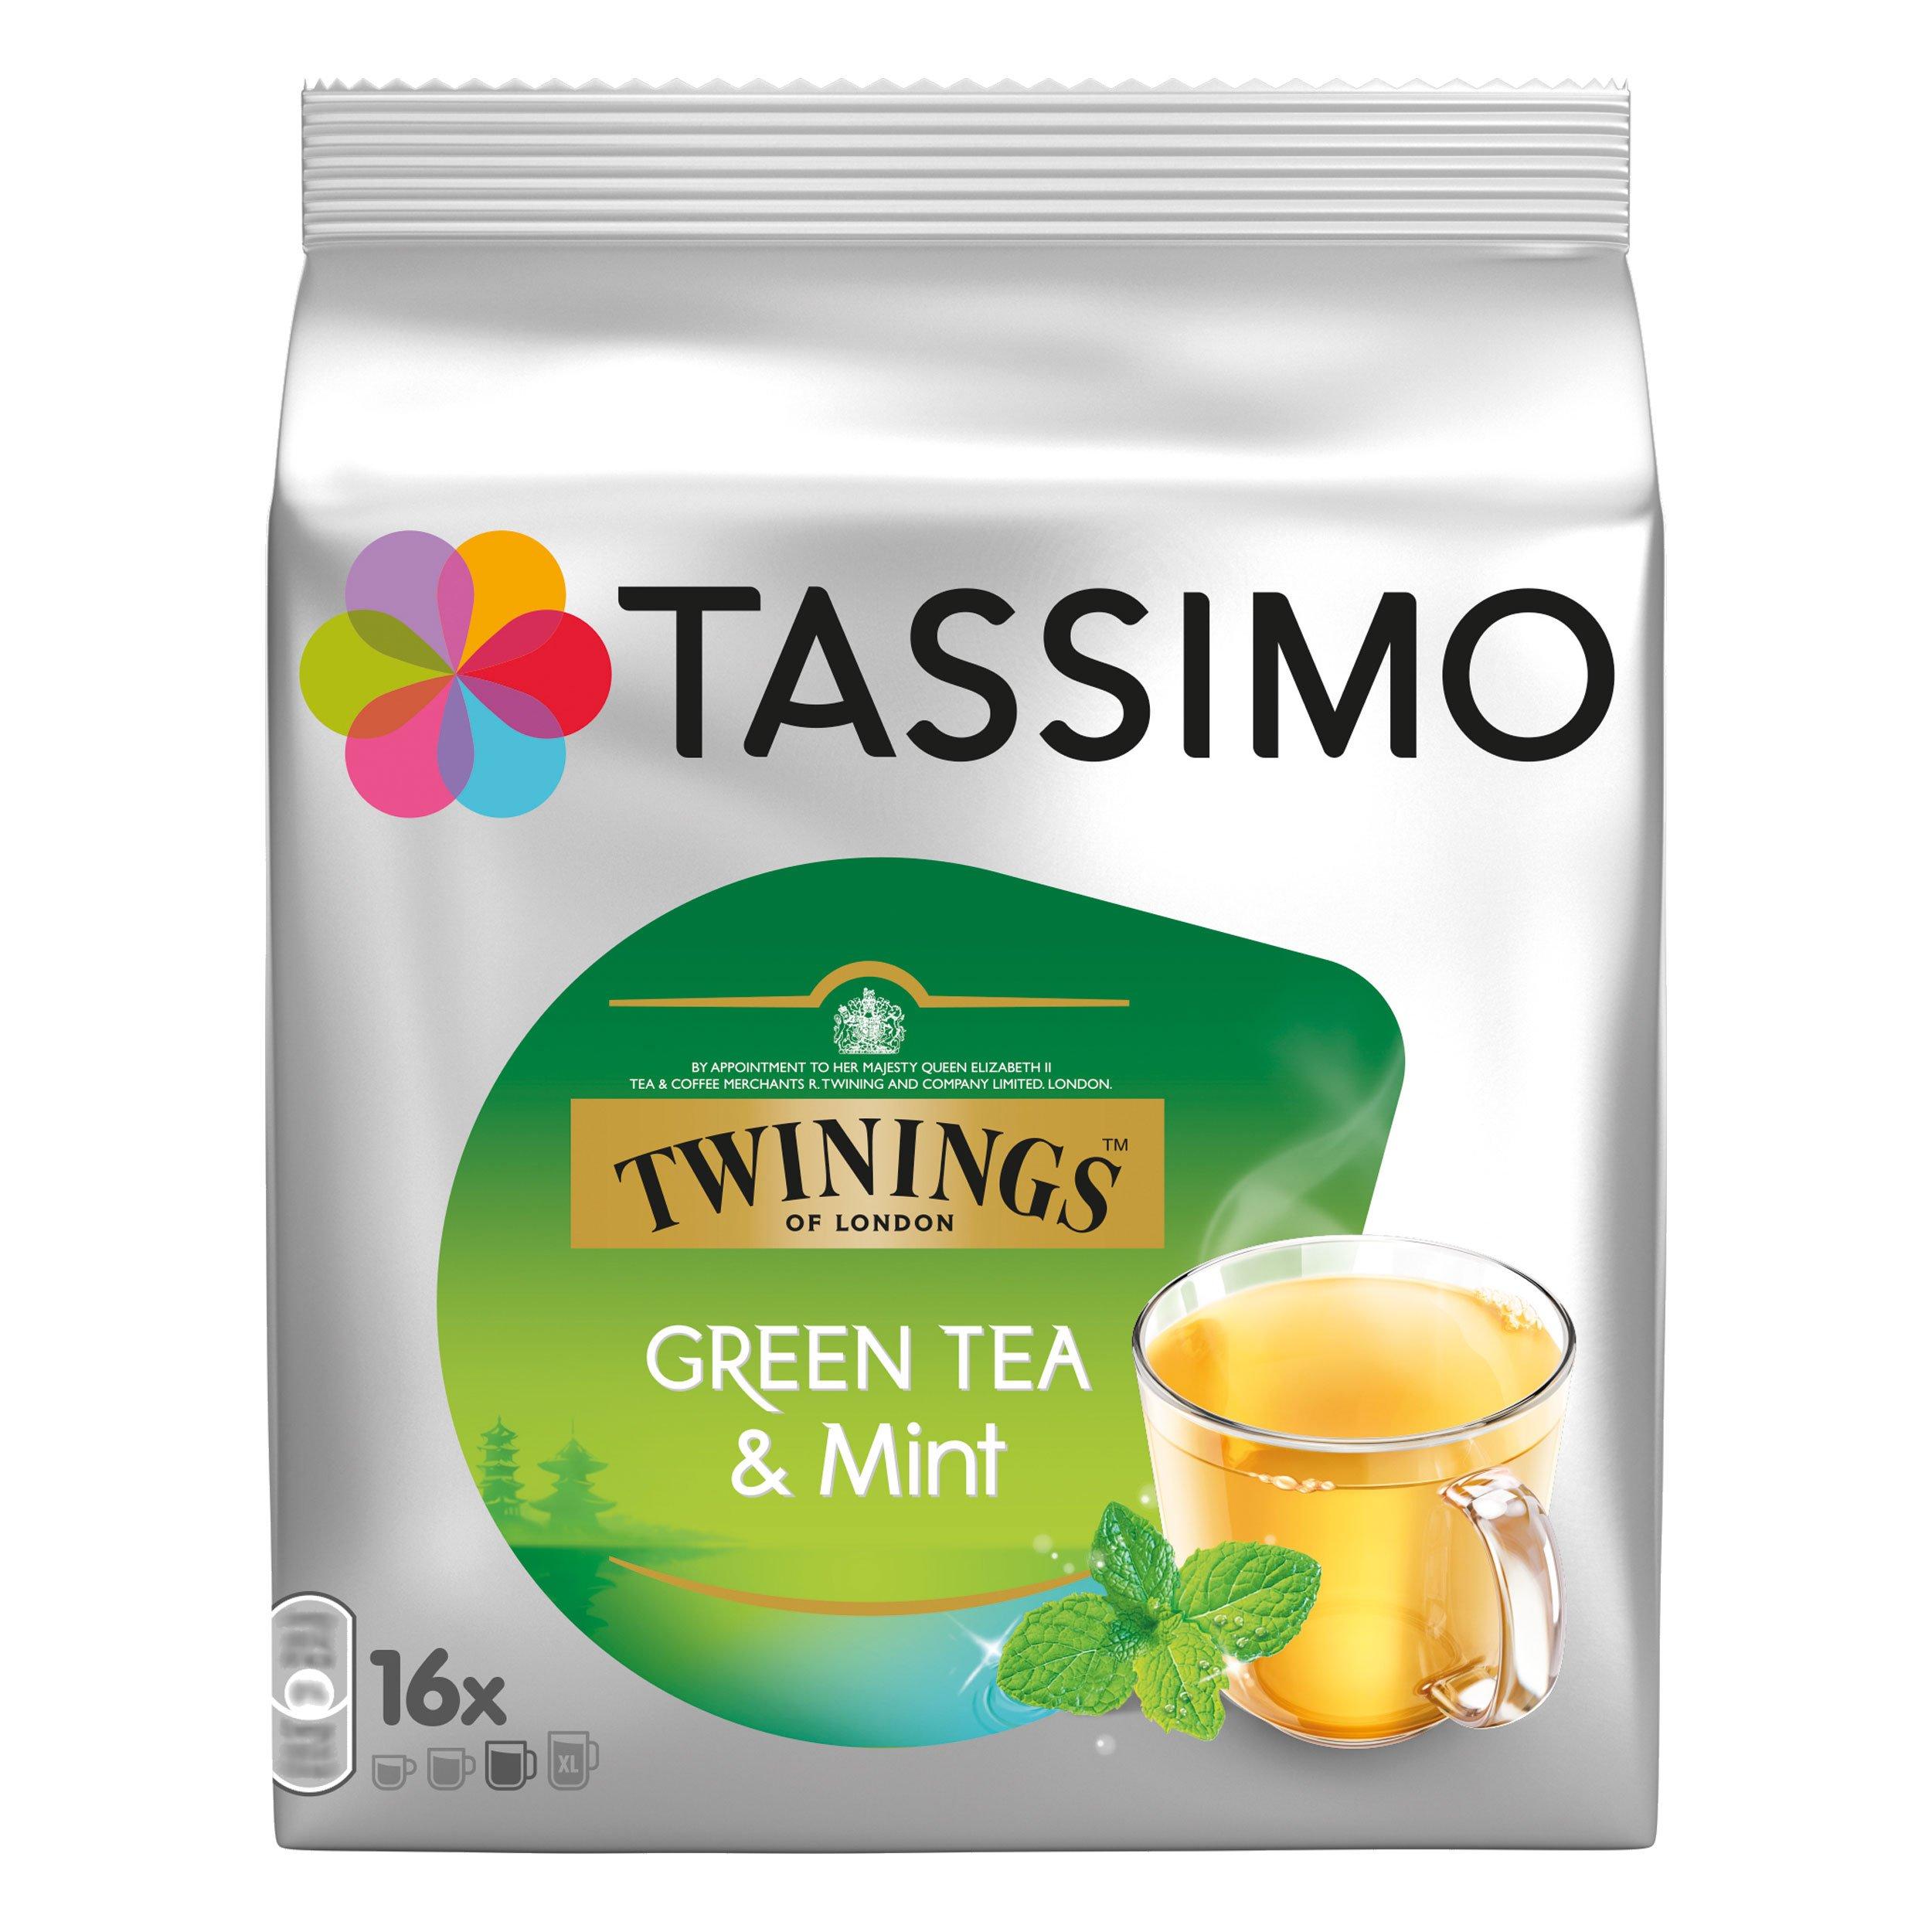 Tassimo Twinings Green Tea & Mint, 16 T-discs